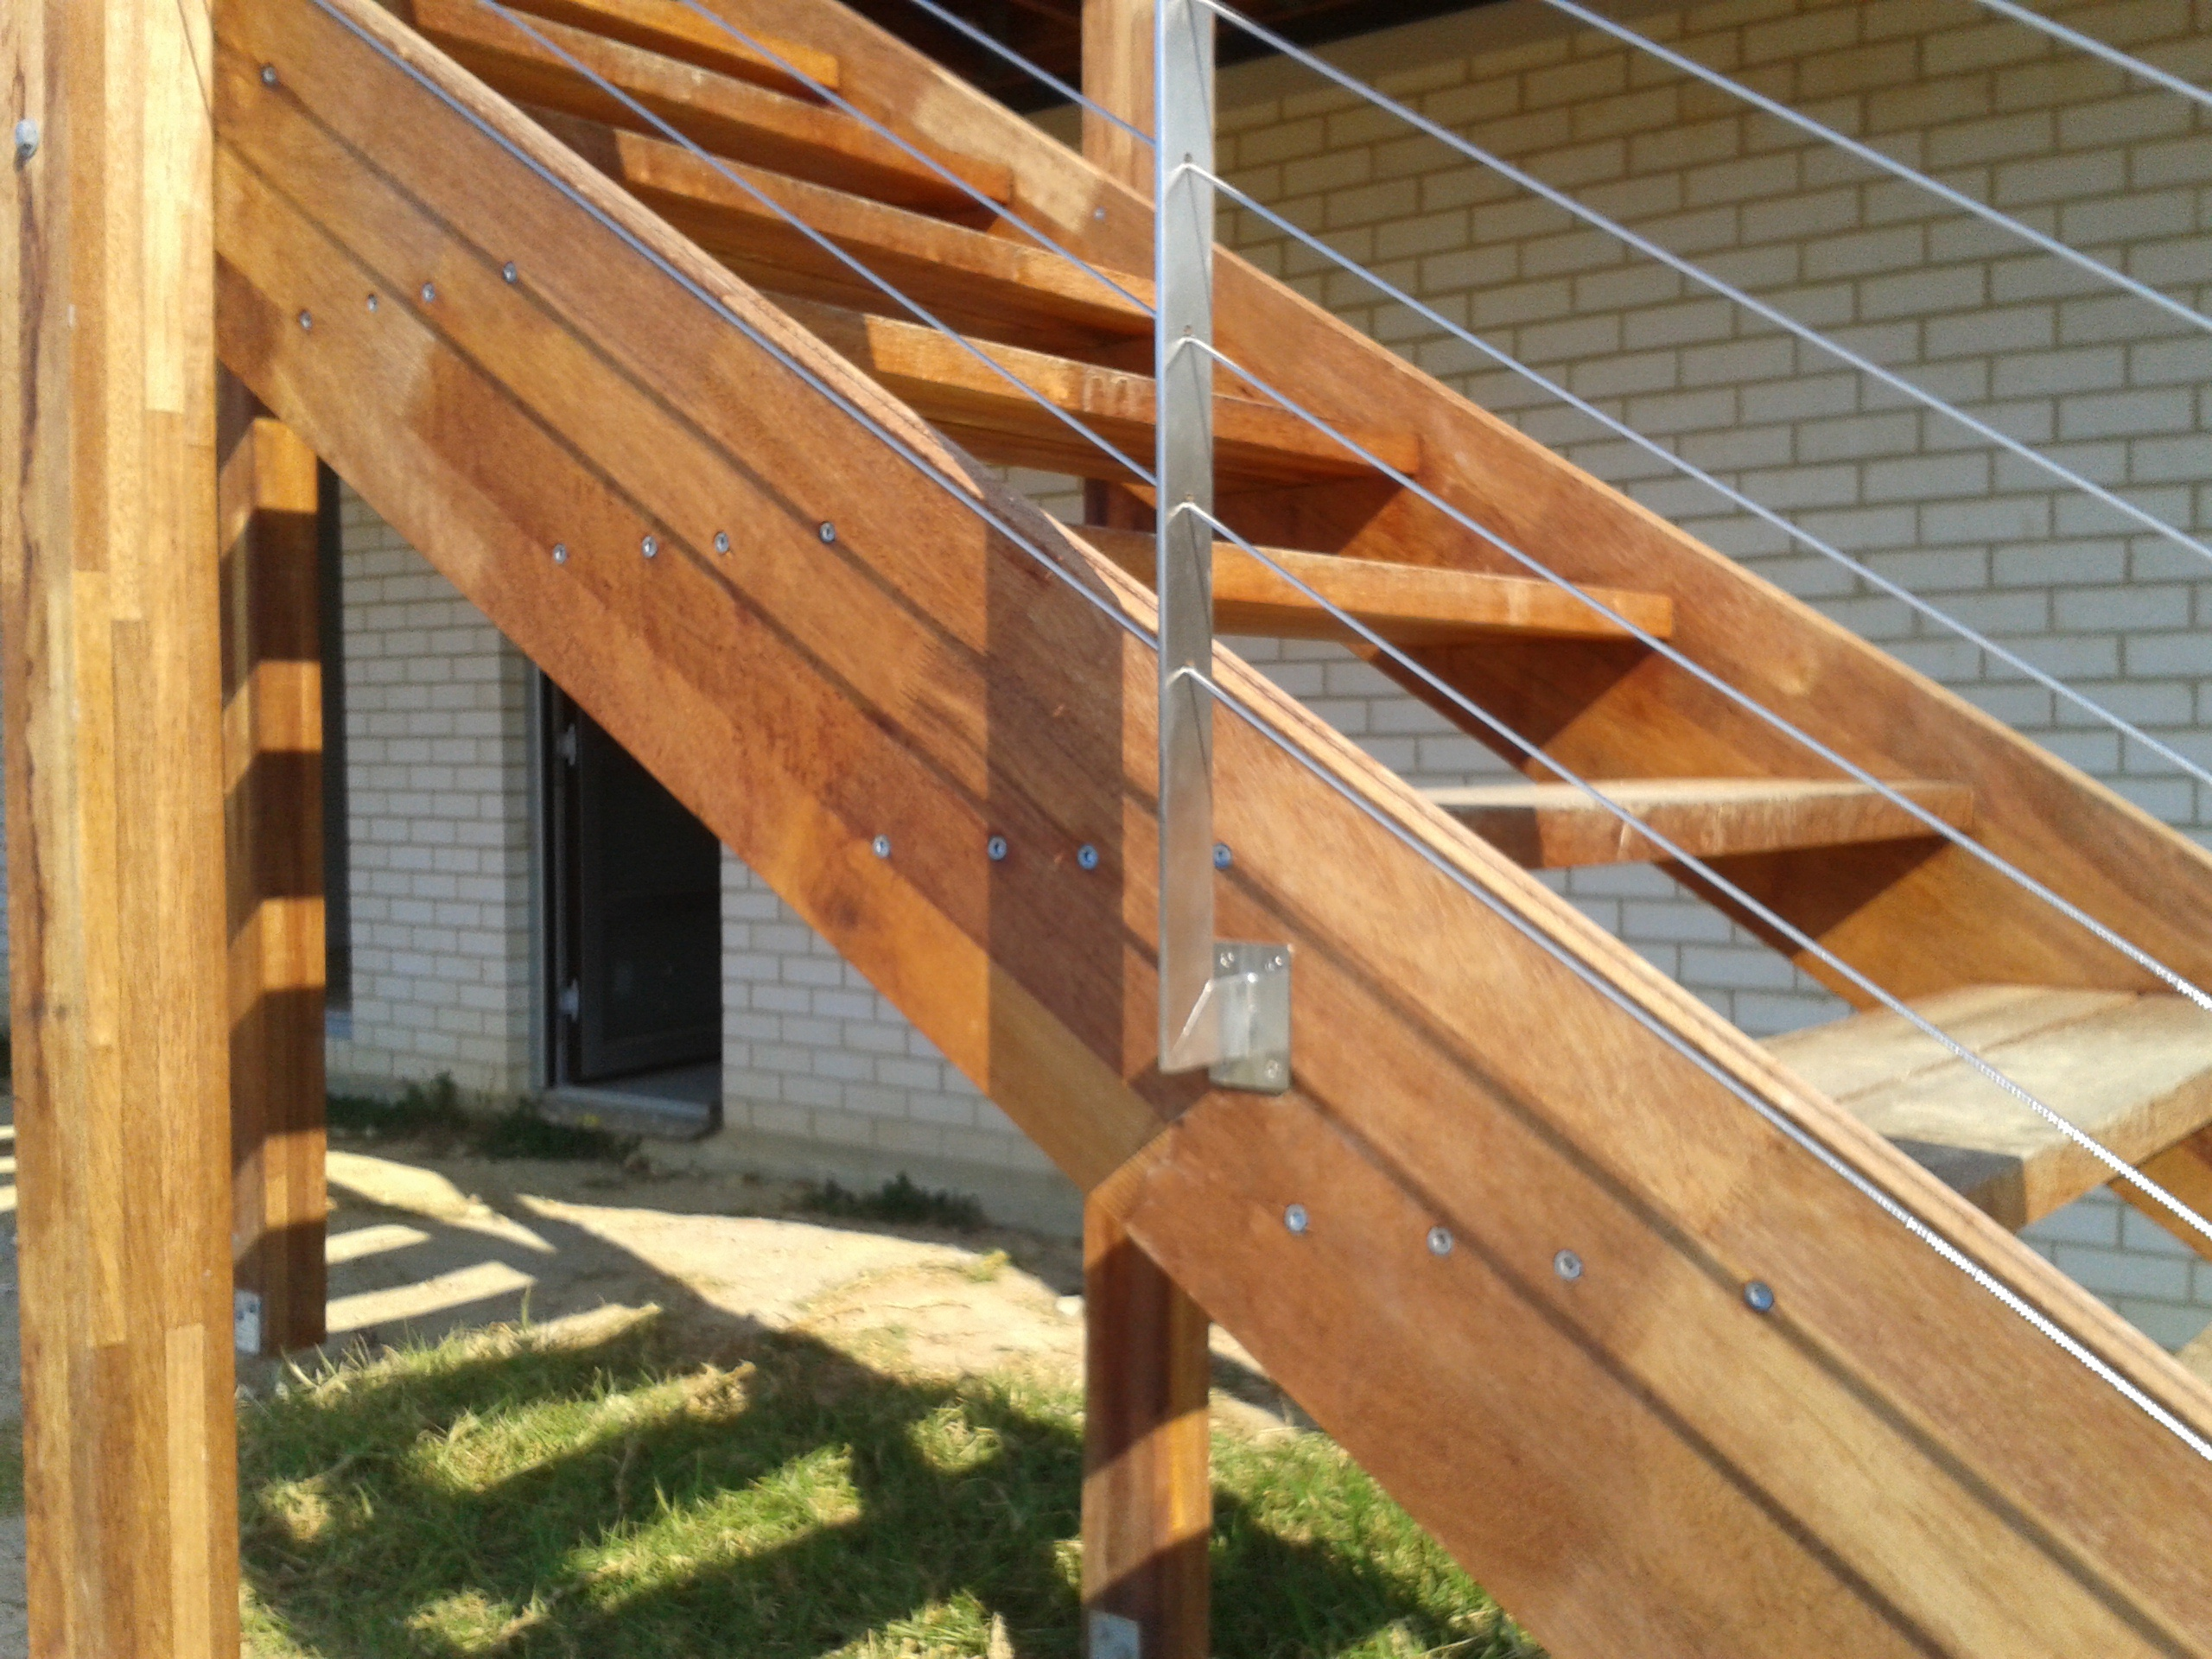 custom stainless steel balustrade posts 2